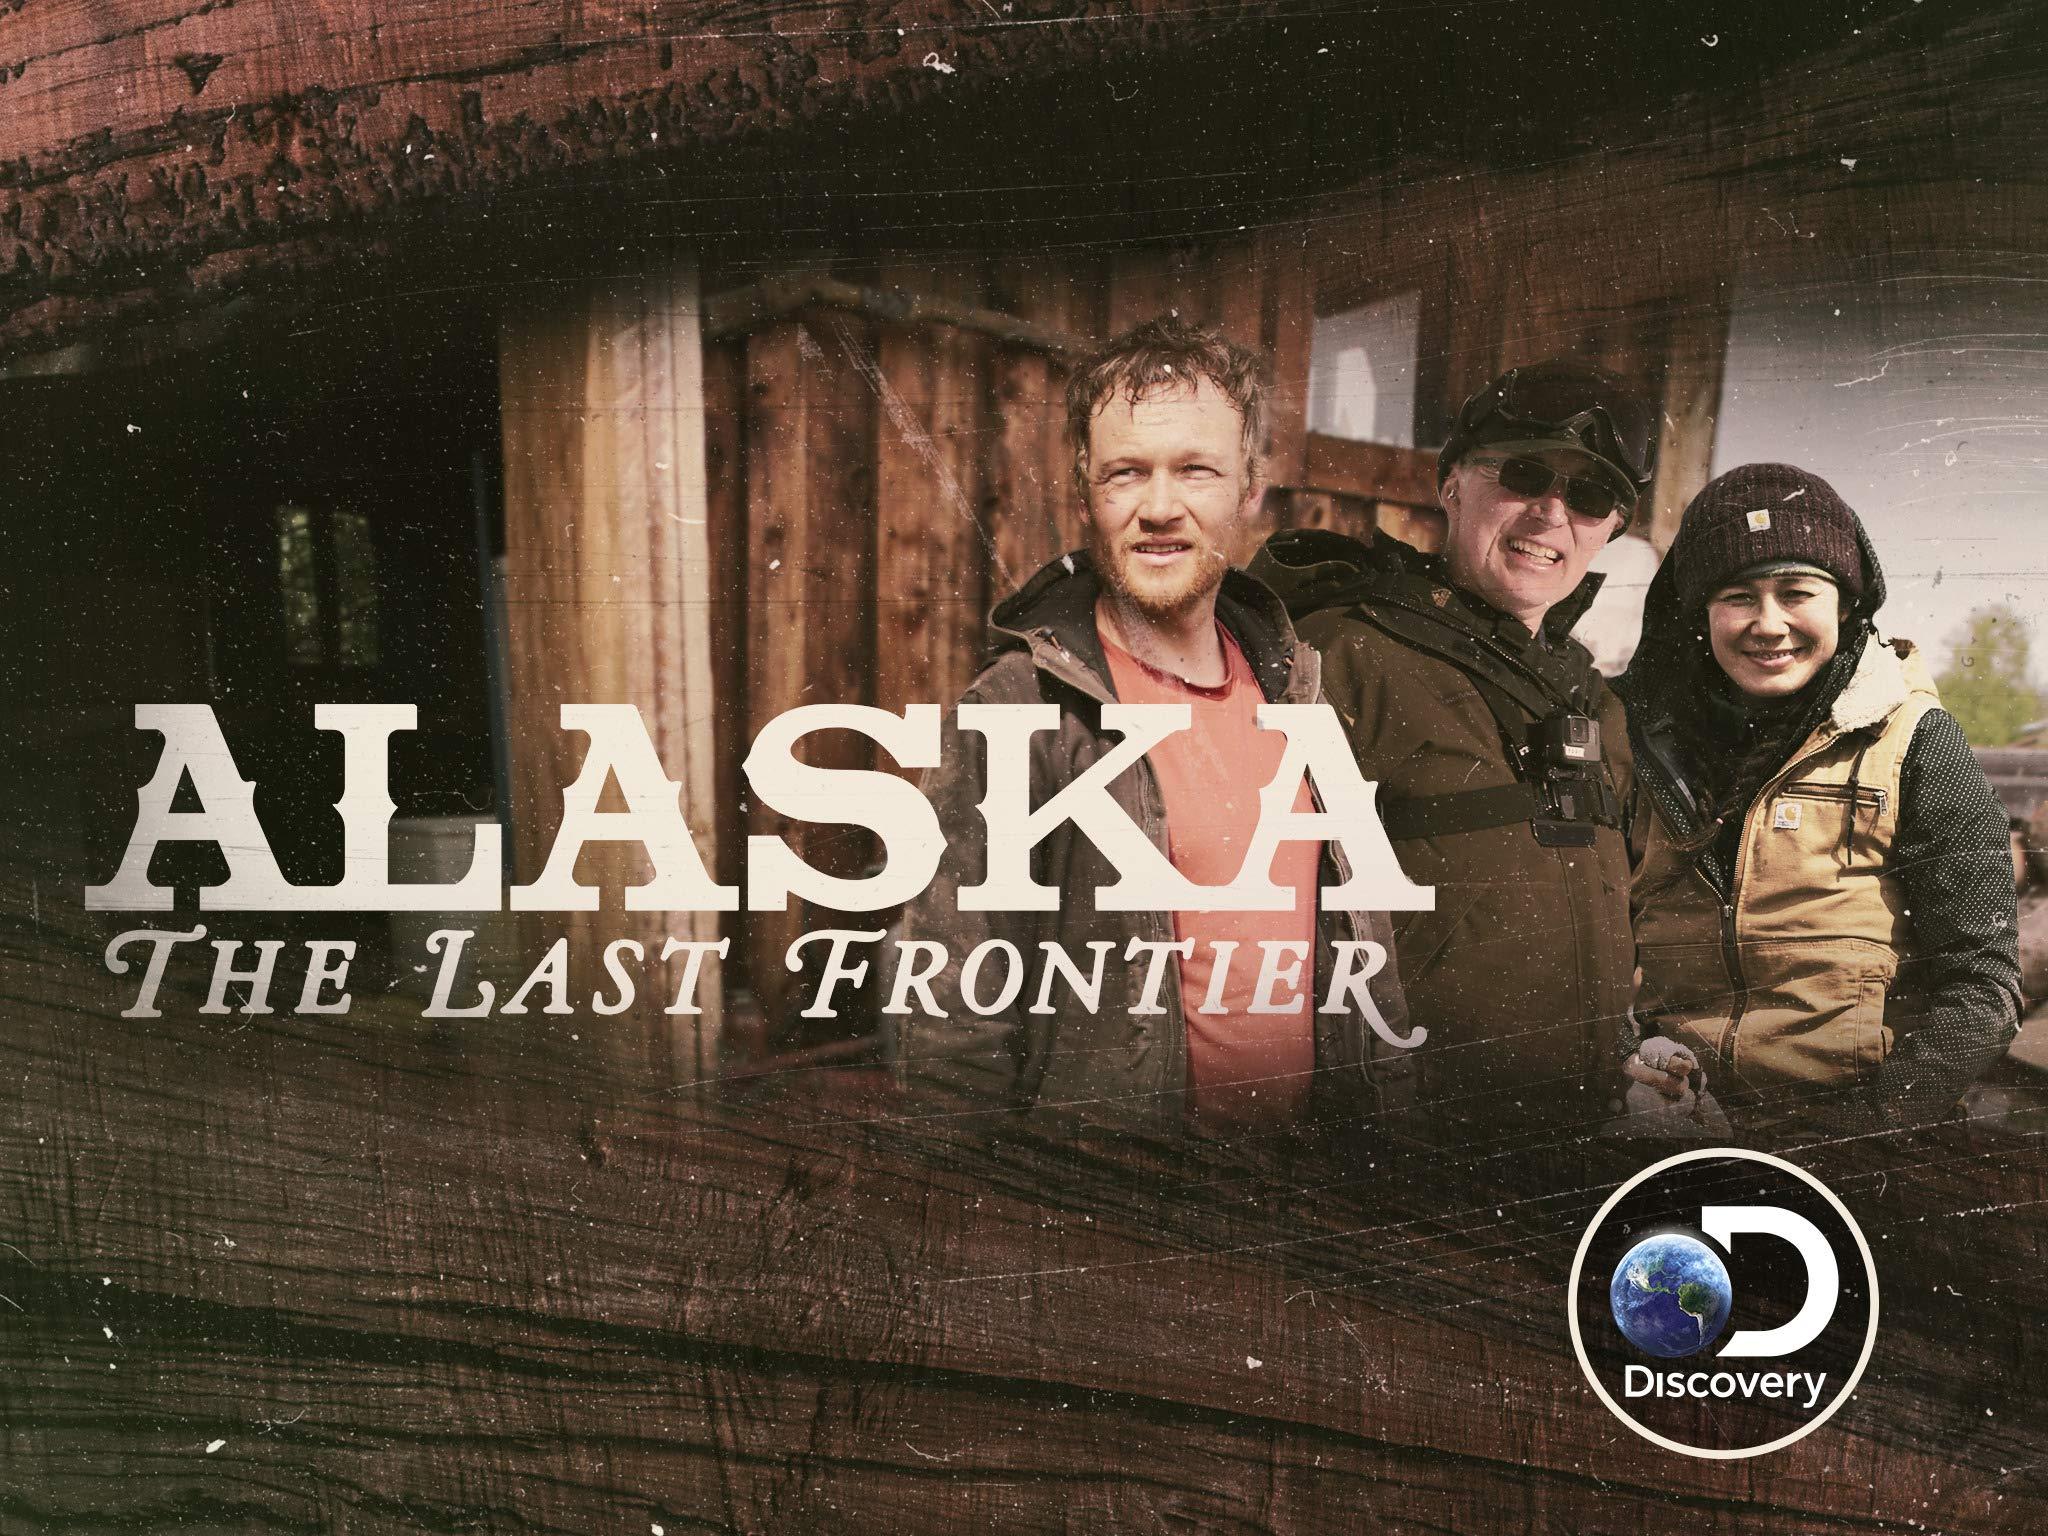 Alaska: The Last Frontier Season 4 Ep 11 Journey to Perl